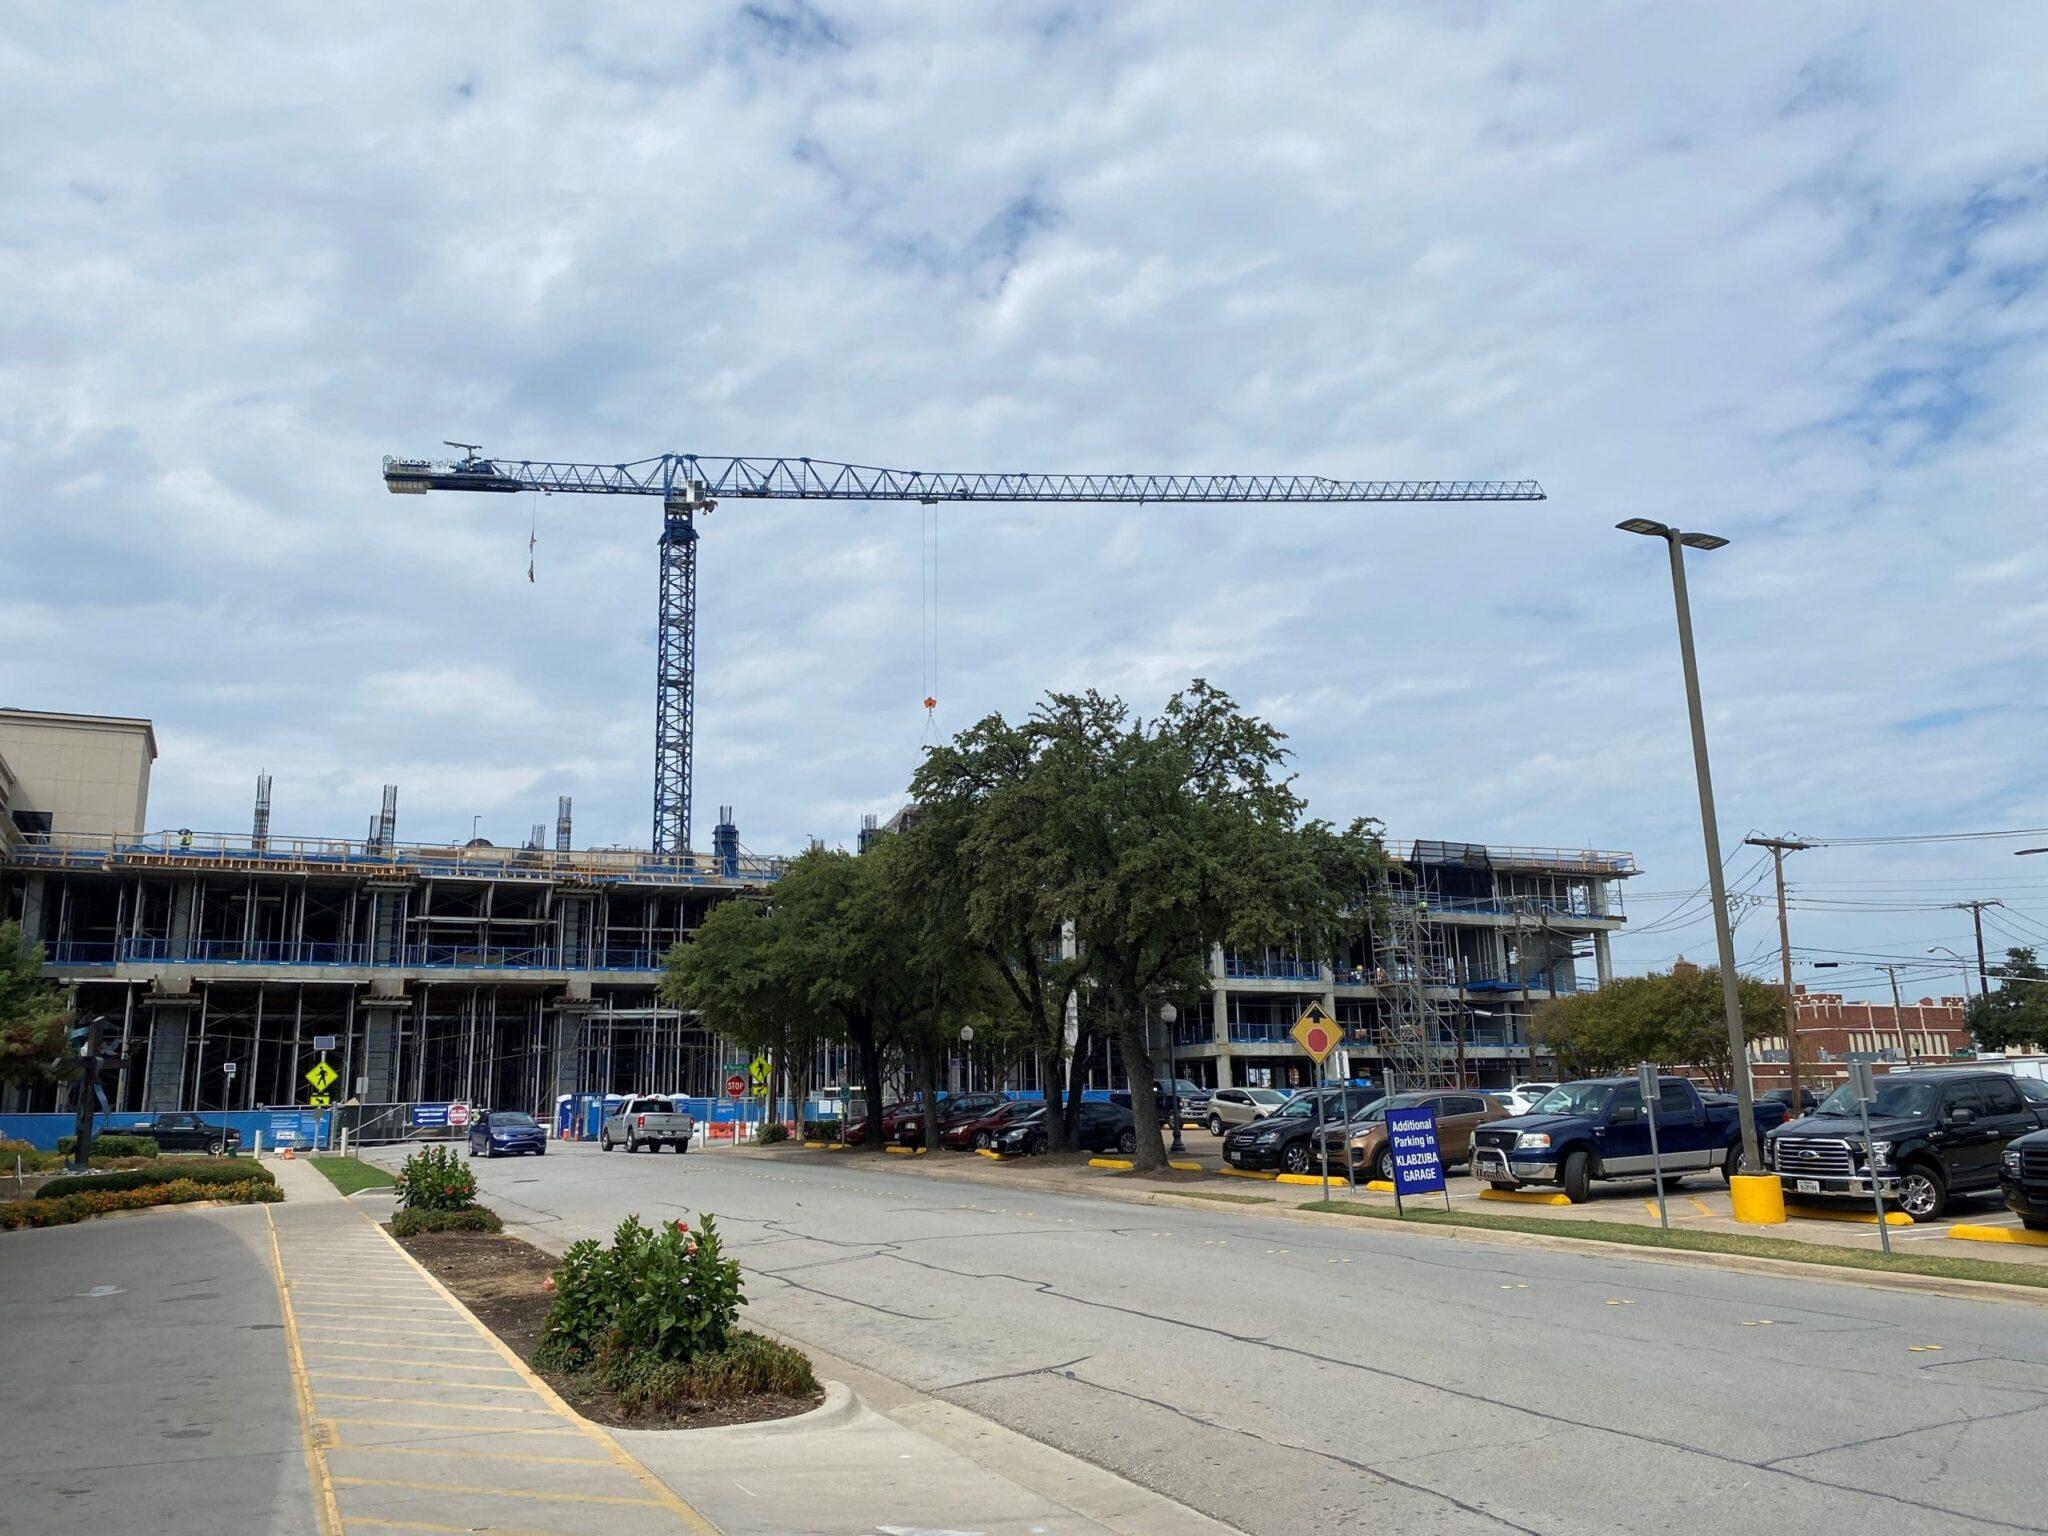 Texas Health's $300 million expansion project reaches major milestone